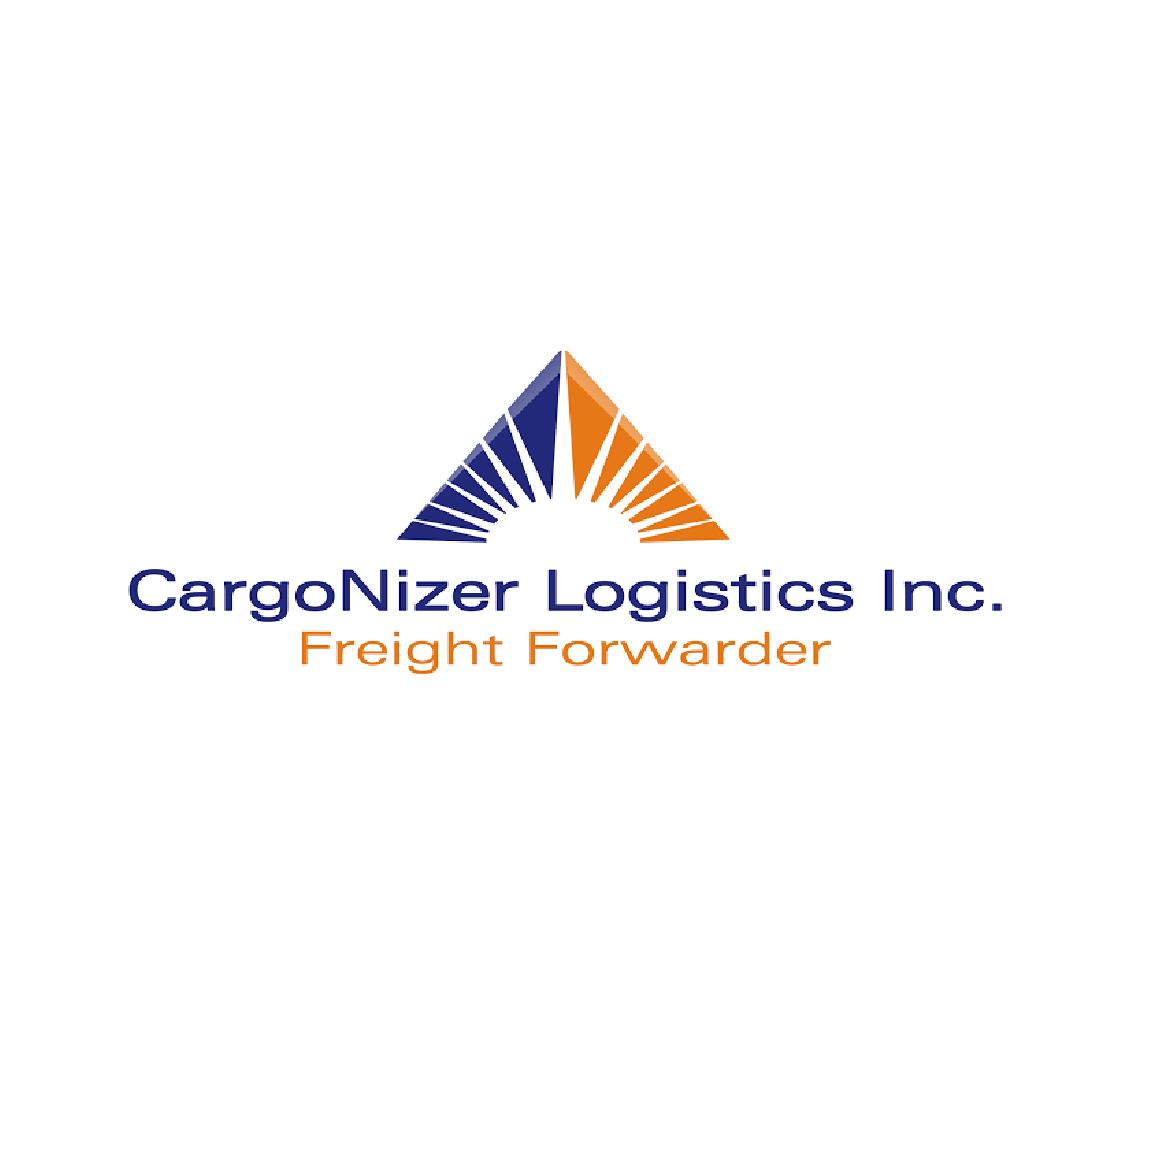 Cargonizer